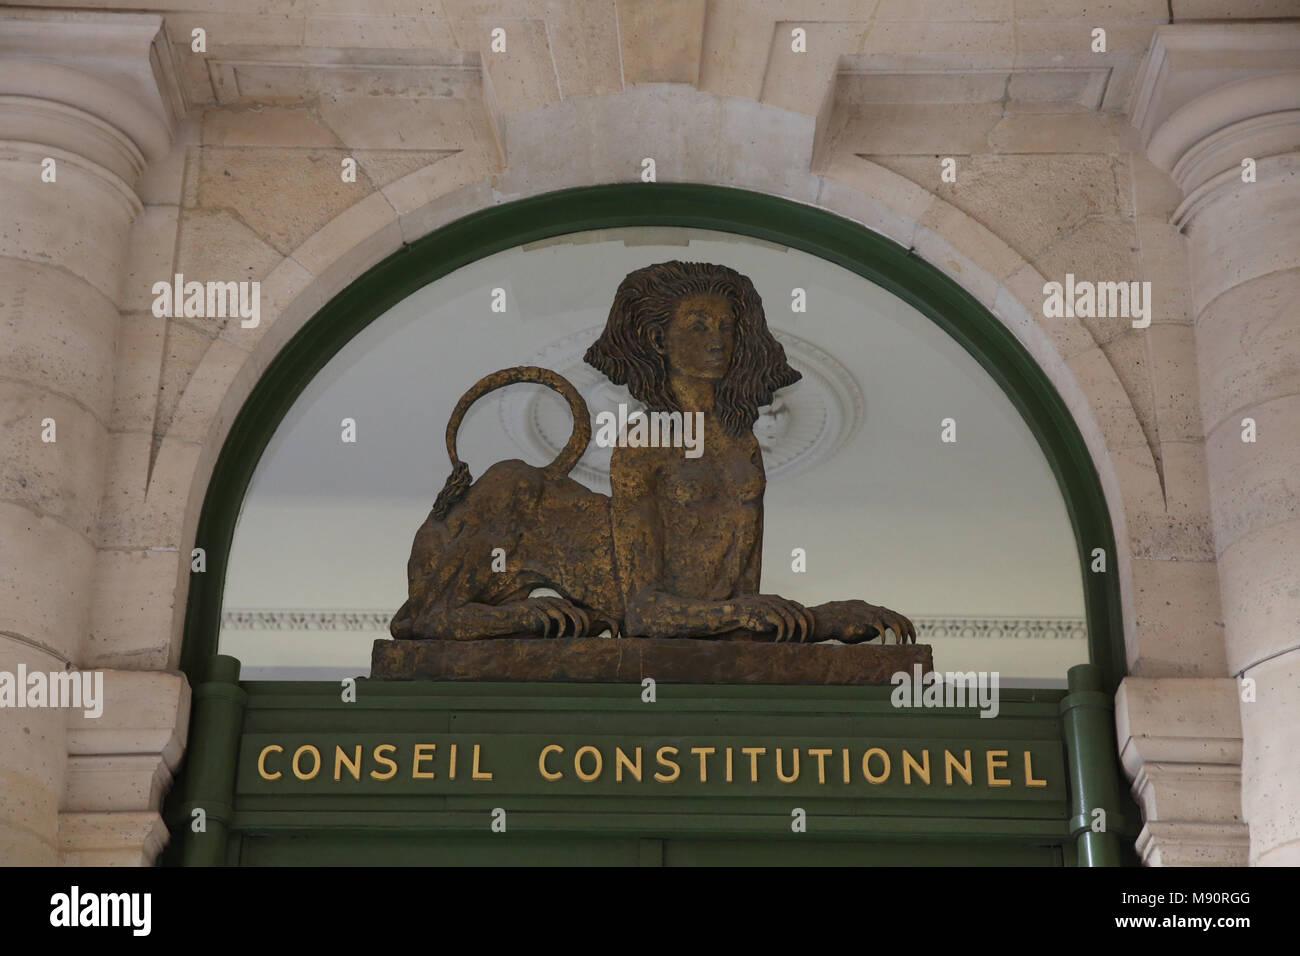 Conseil constitutionnel, Paris, France. - Stock Image